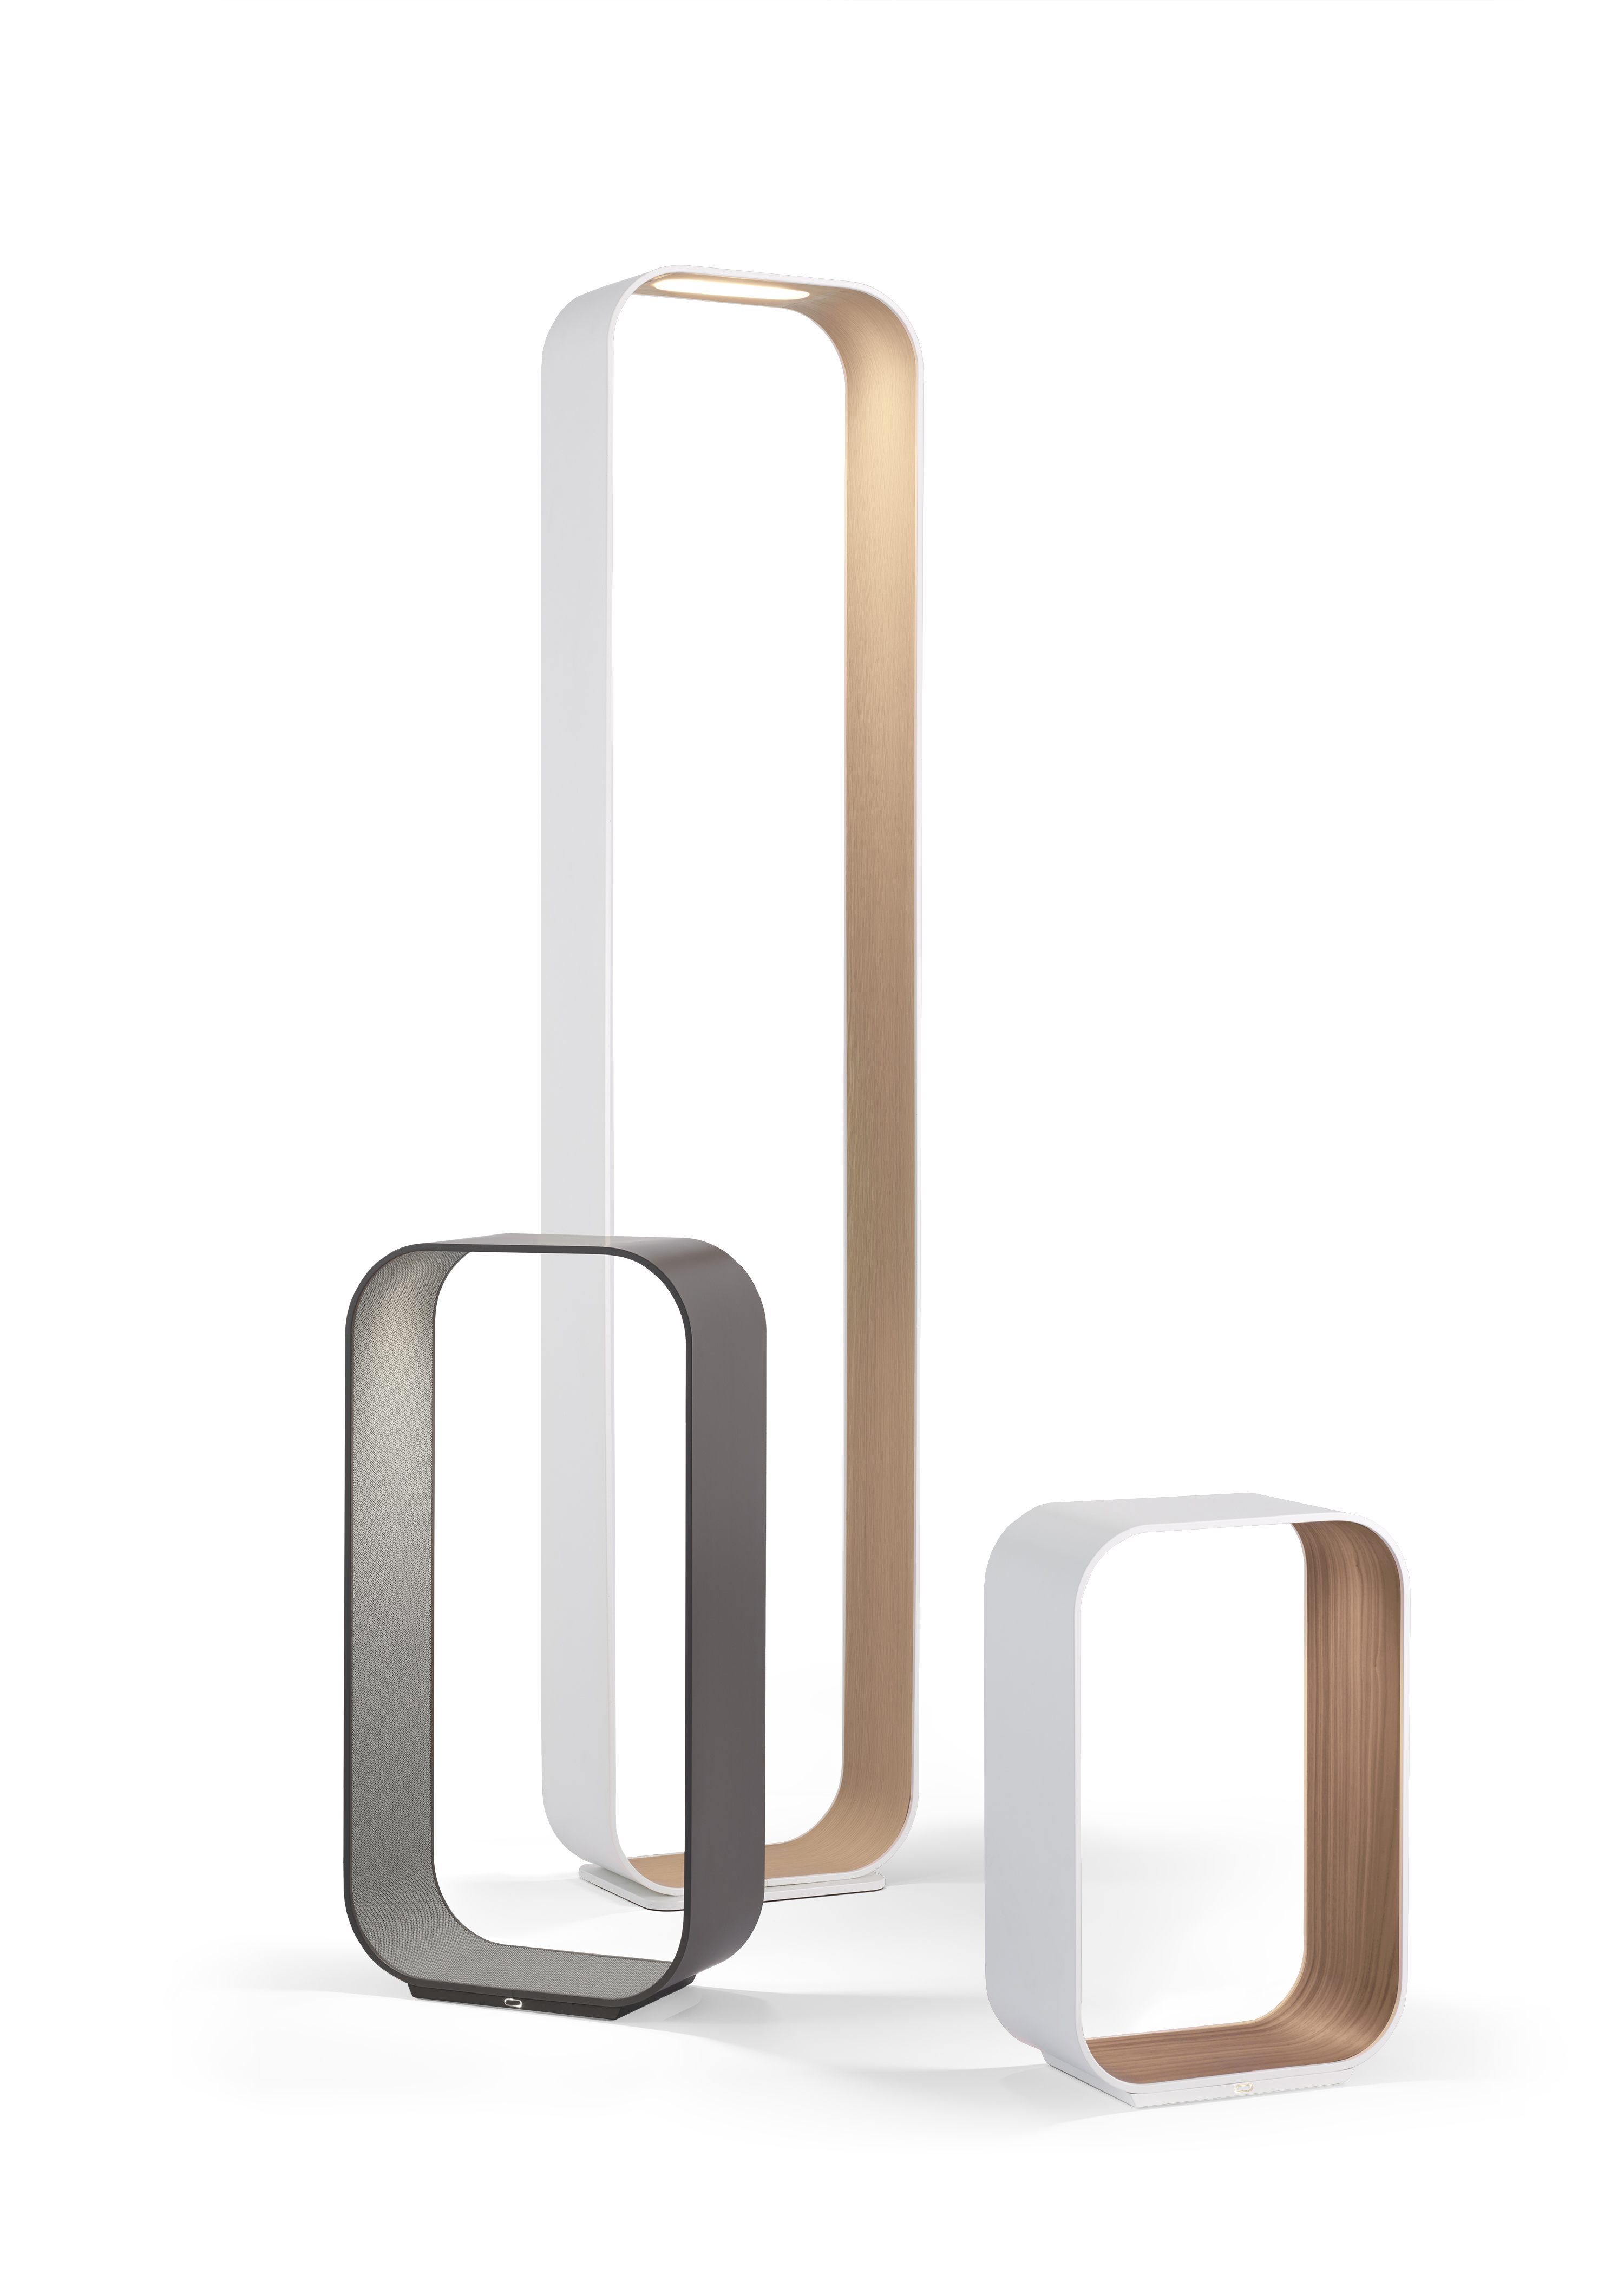 Lighting: Pablo Designs Contour